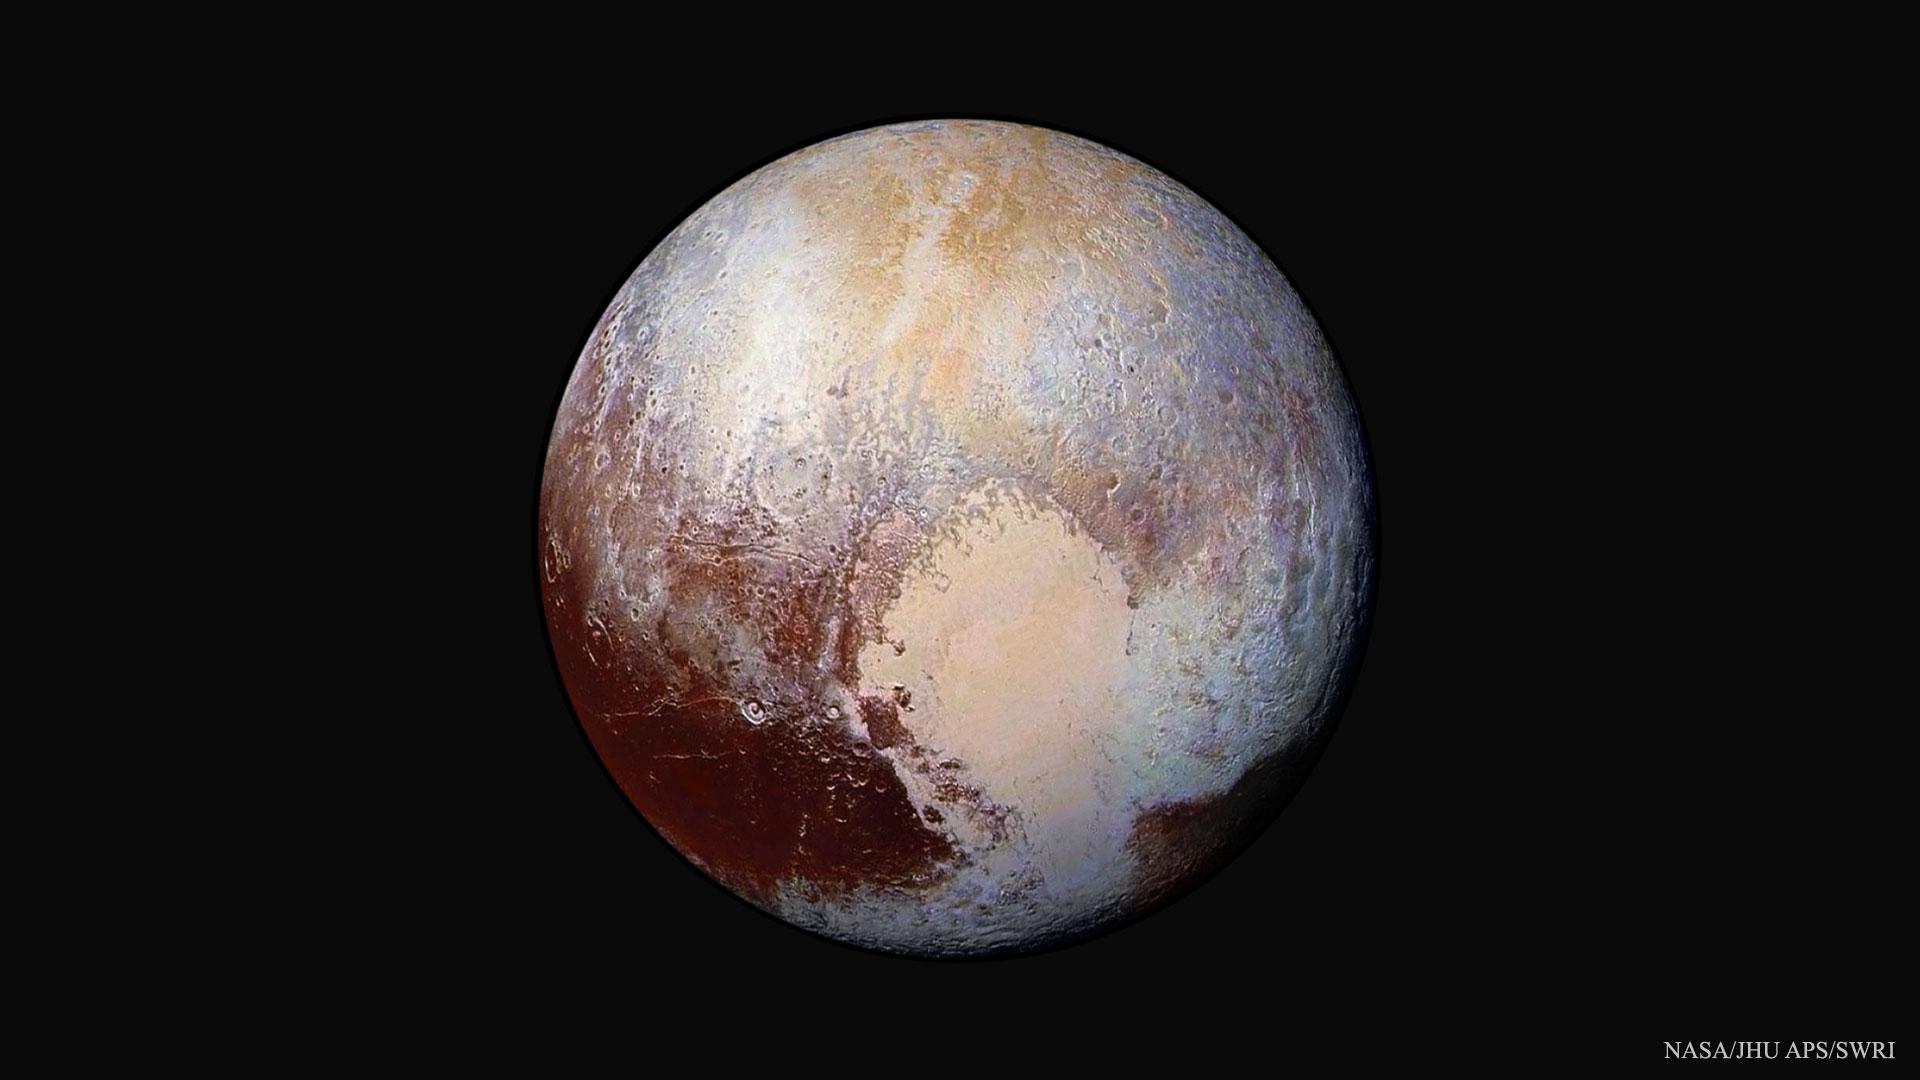 http://apod.nasa.gov/apod/image/1508/PlutoEnhanced_NewHorizons_1920.jpg